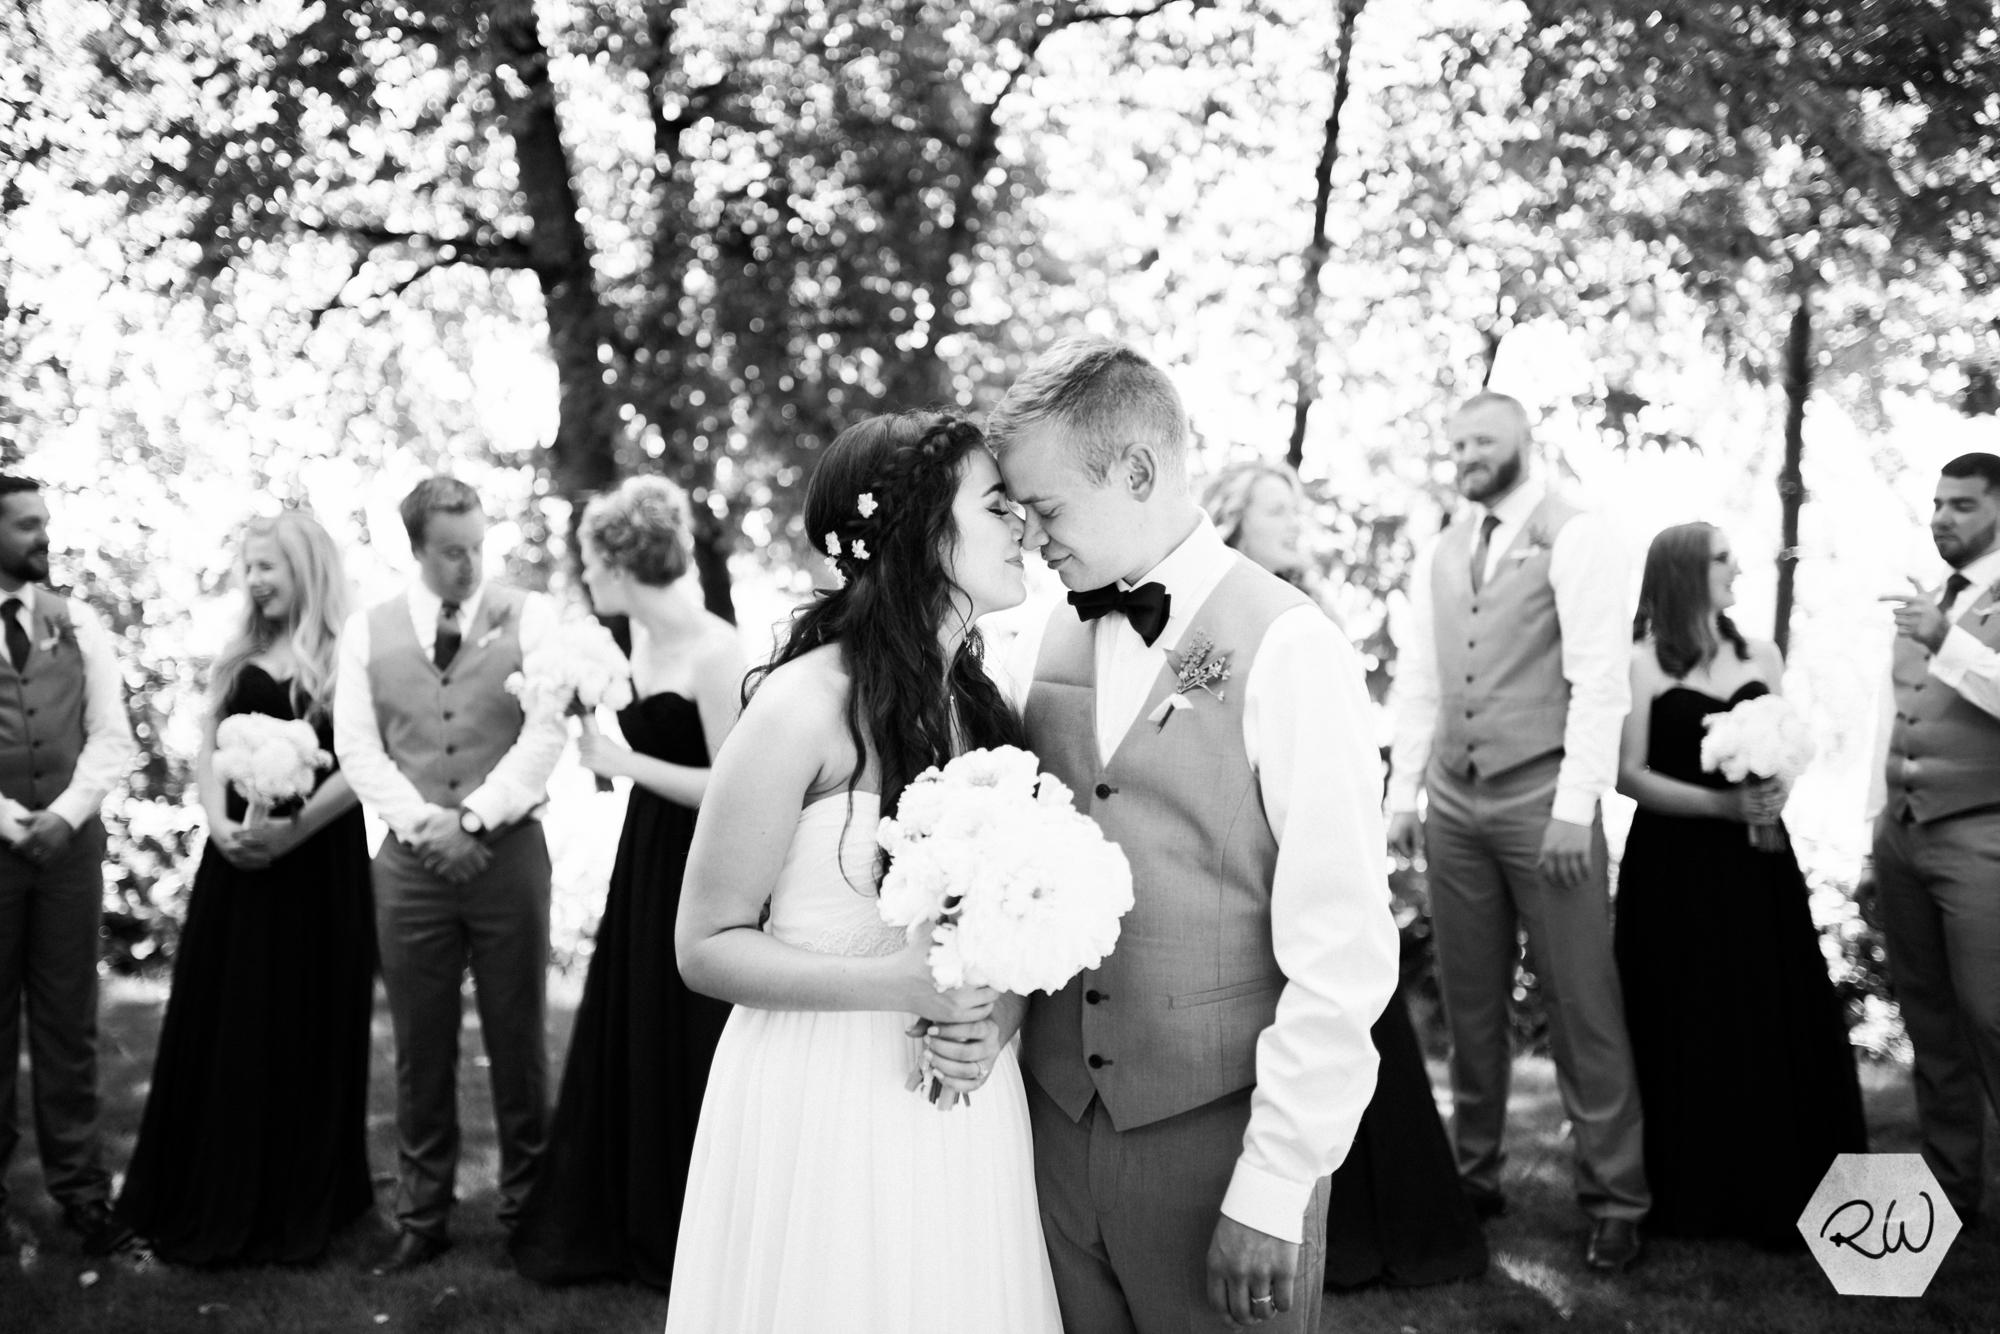 Ben & Sophia Vandenberg 465-2.jpg